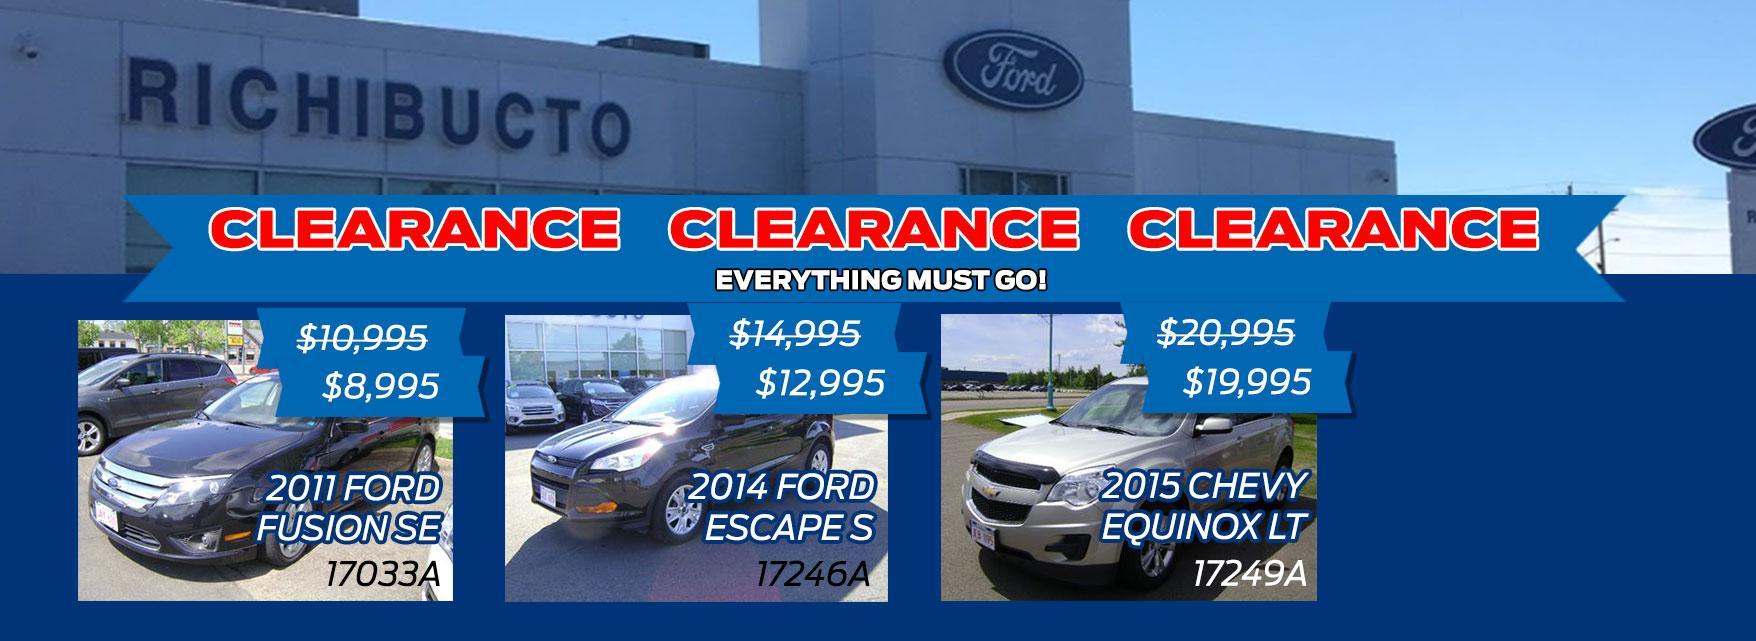 Richibucto Motors - Clearance Sale